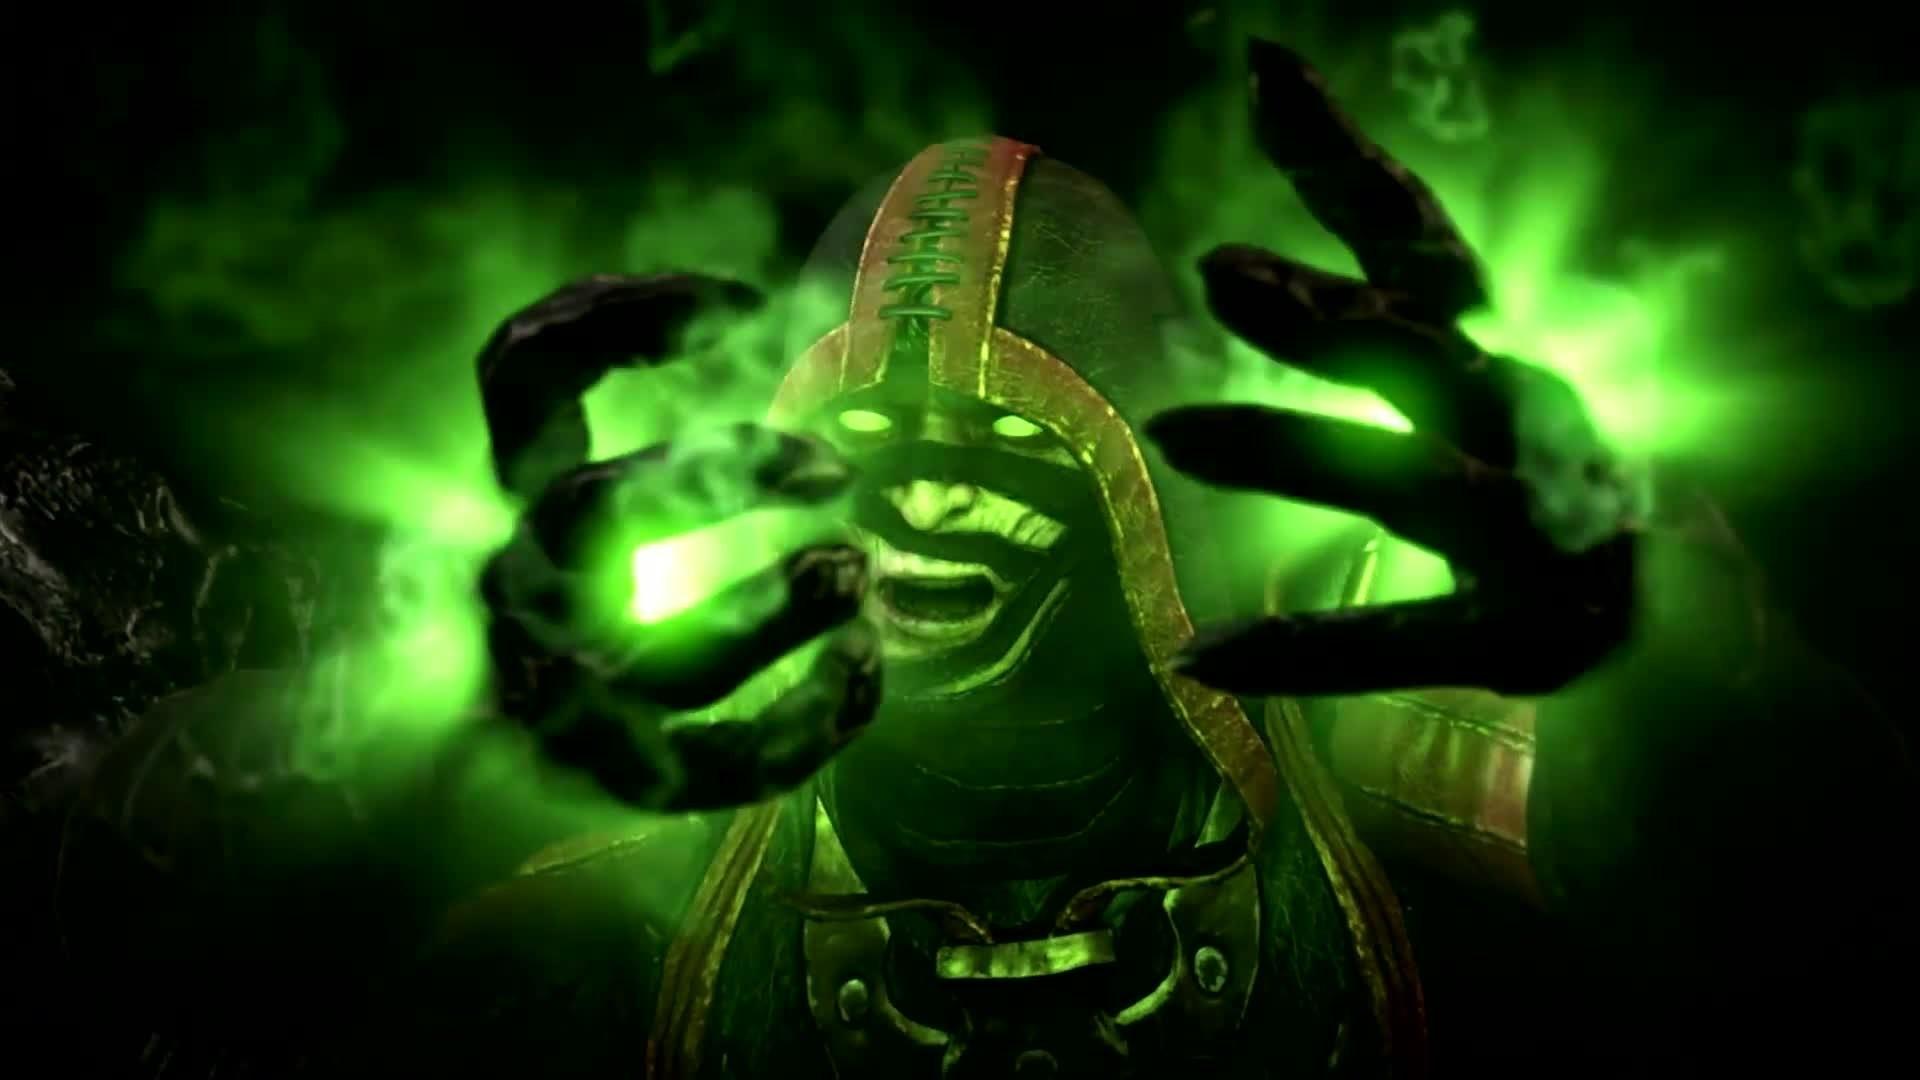 Mortal Kombat X Ermac wallpapers (22 Wallpapers)